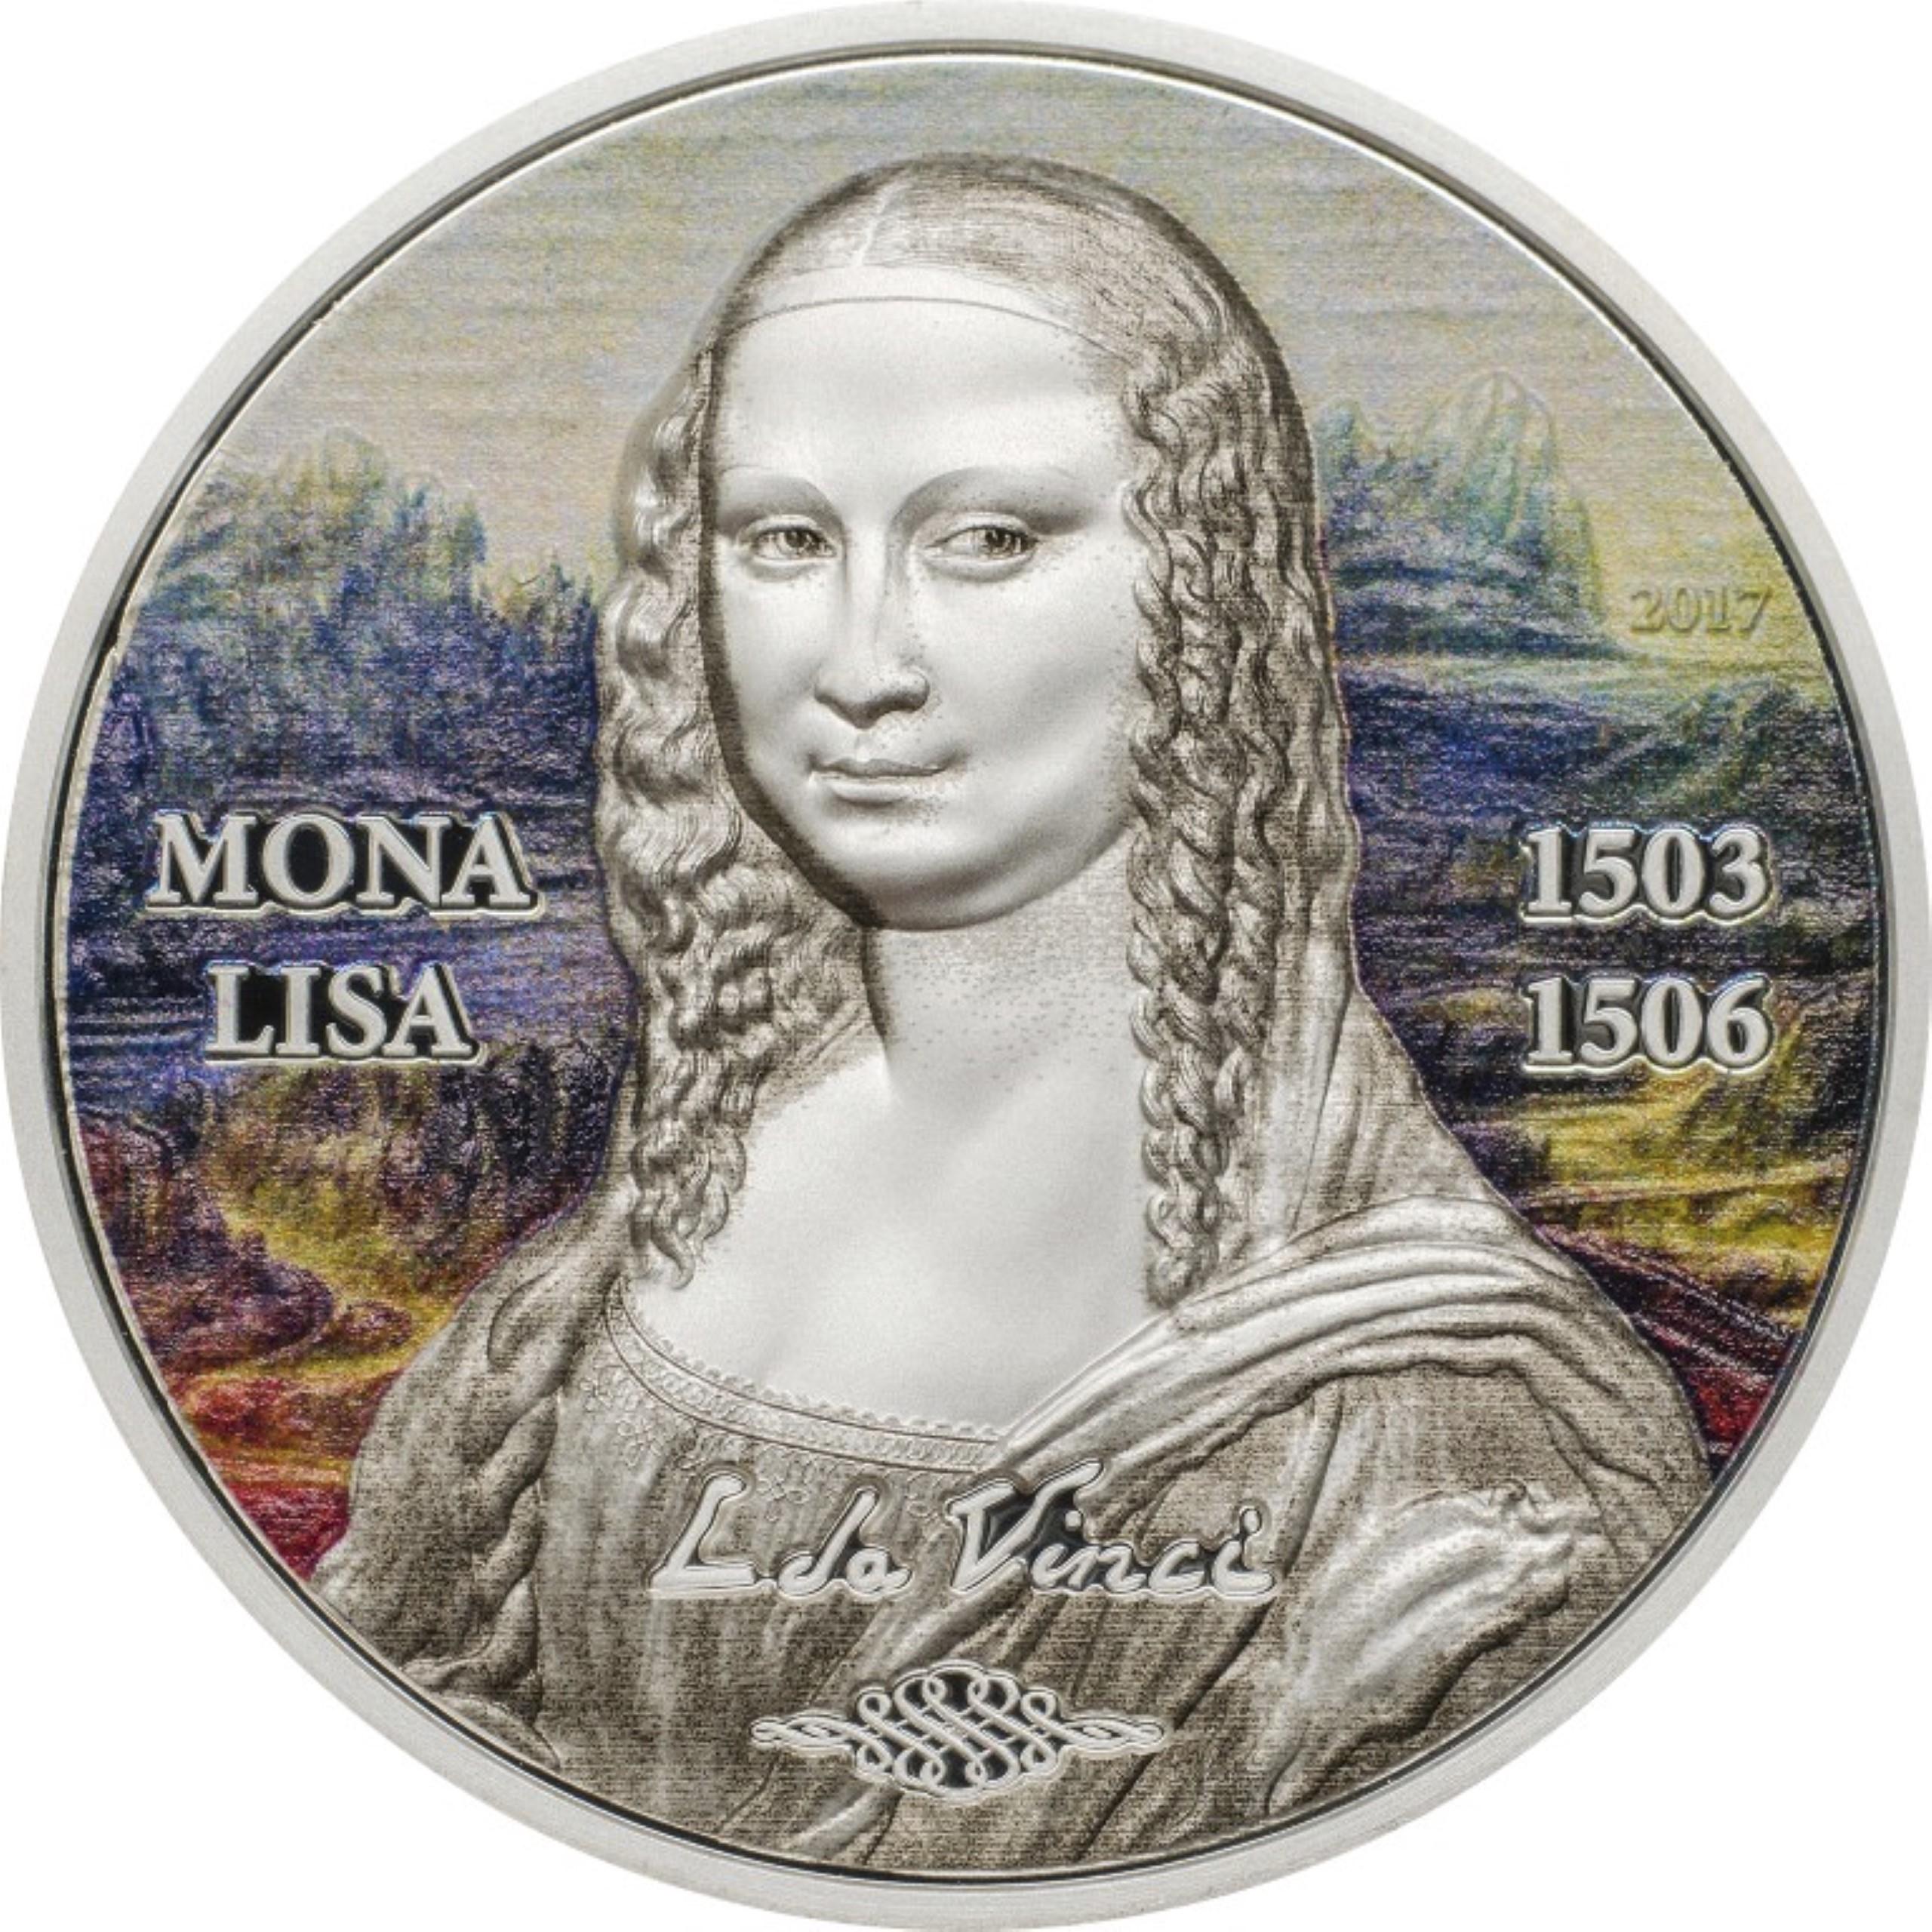 Palau - 2017 - 5 Dollars - Art Revived MONA LISA